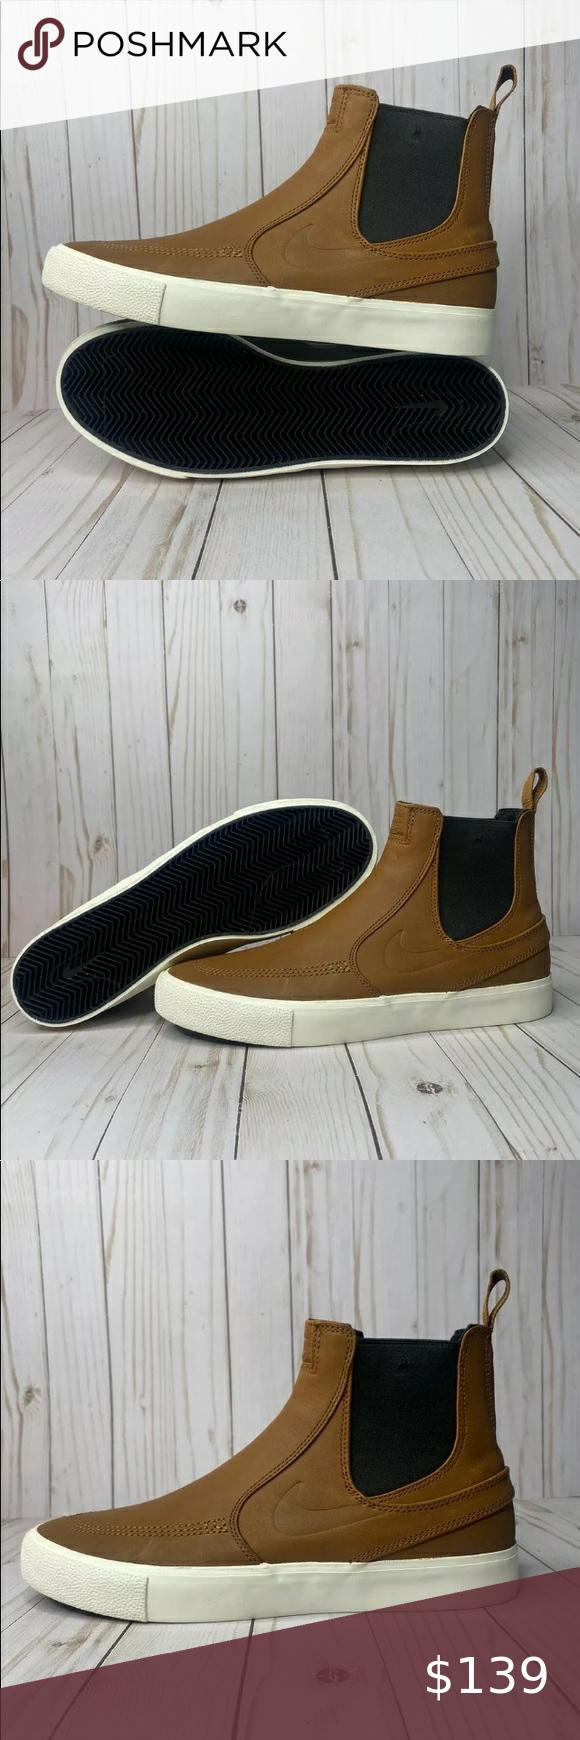 Nwb Nike Sb Zoom Stefan Janoski Shoes Size 6 Stefan Janoski Shoes Janoski Shoes Nike Zoom Stefan Janoski